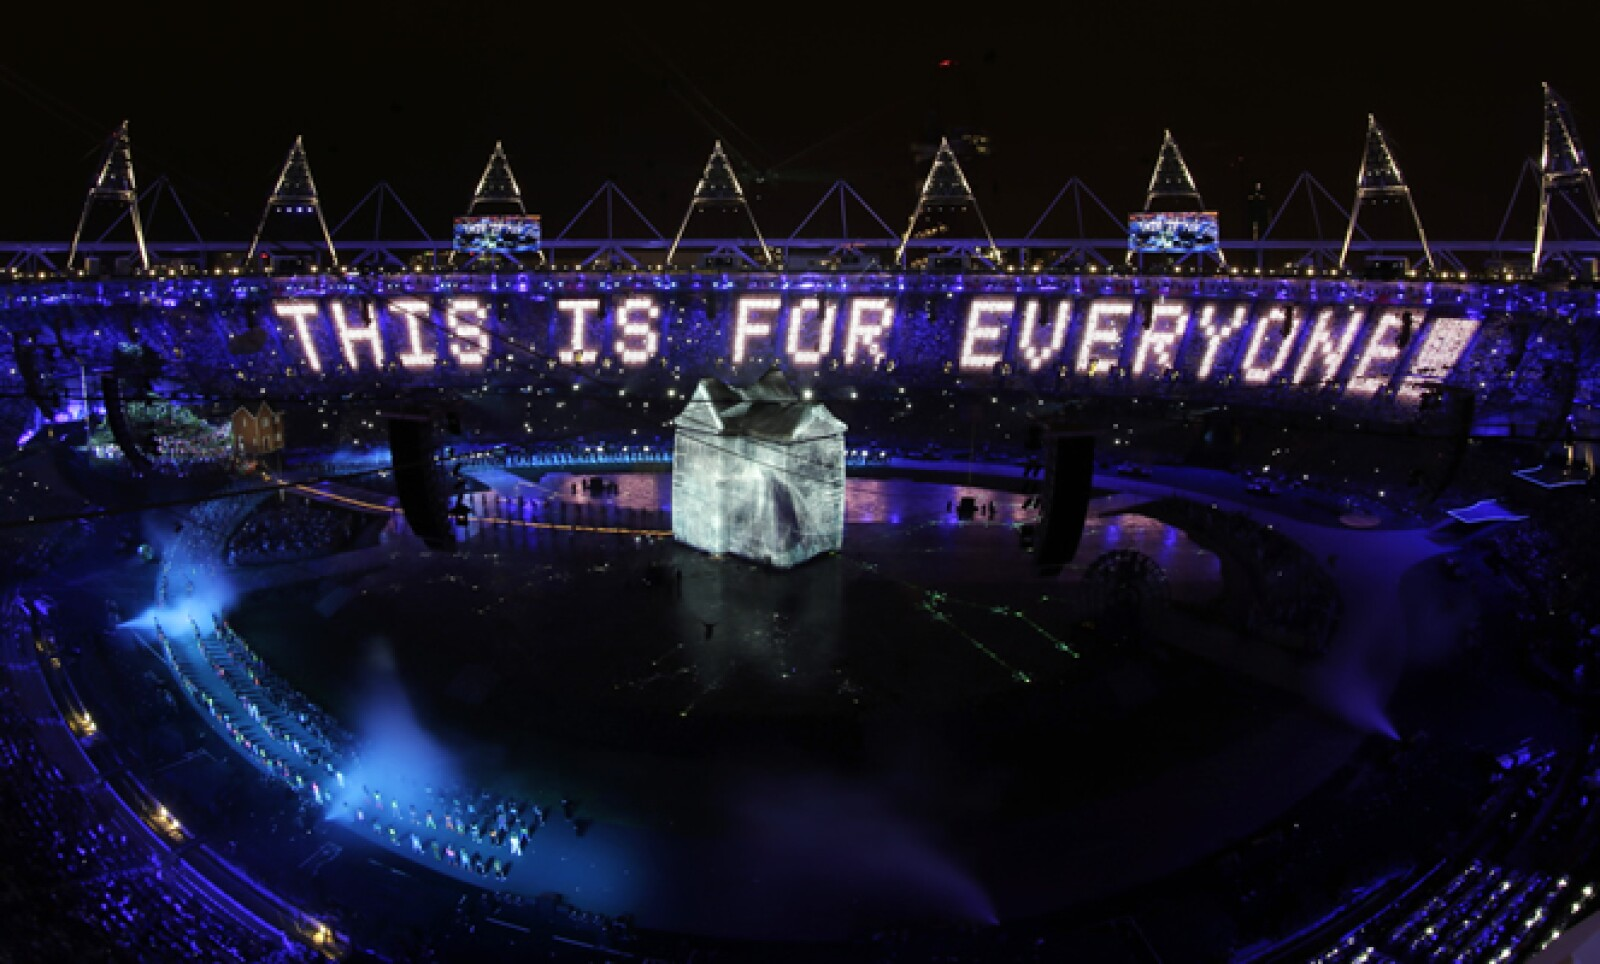 Londres rindió un homenaje a Sir Tim Berners-Lee, inventor de la World Wide Web.